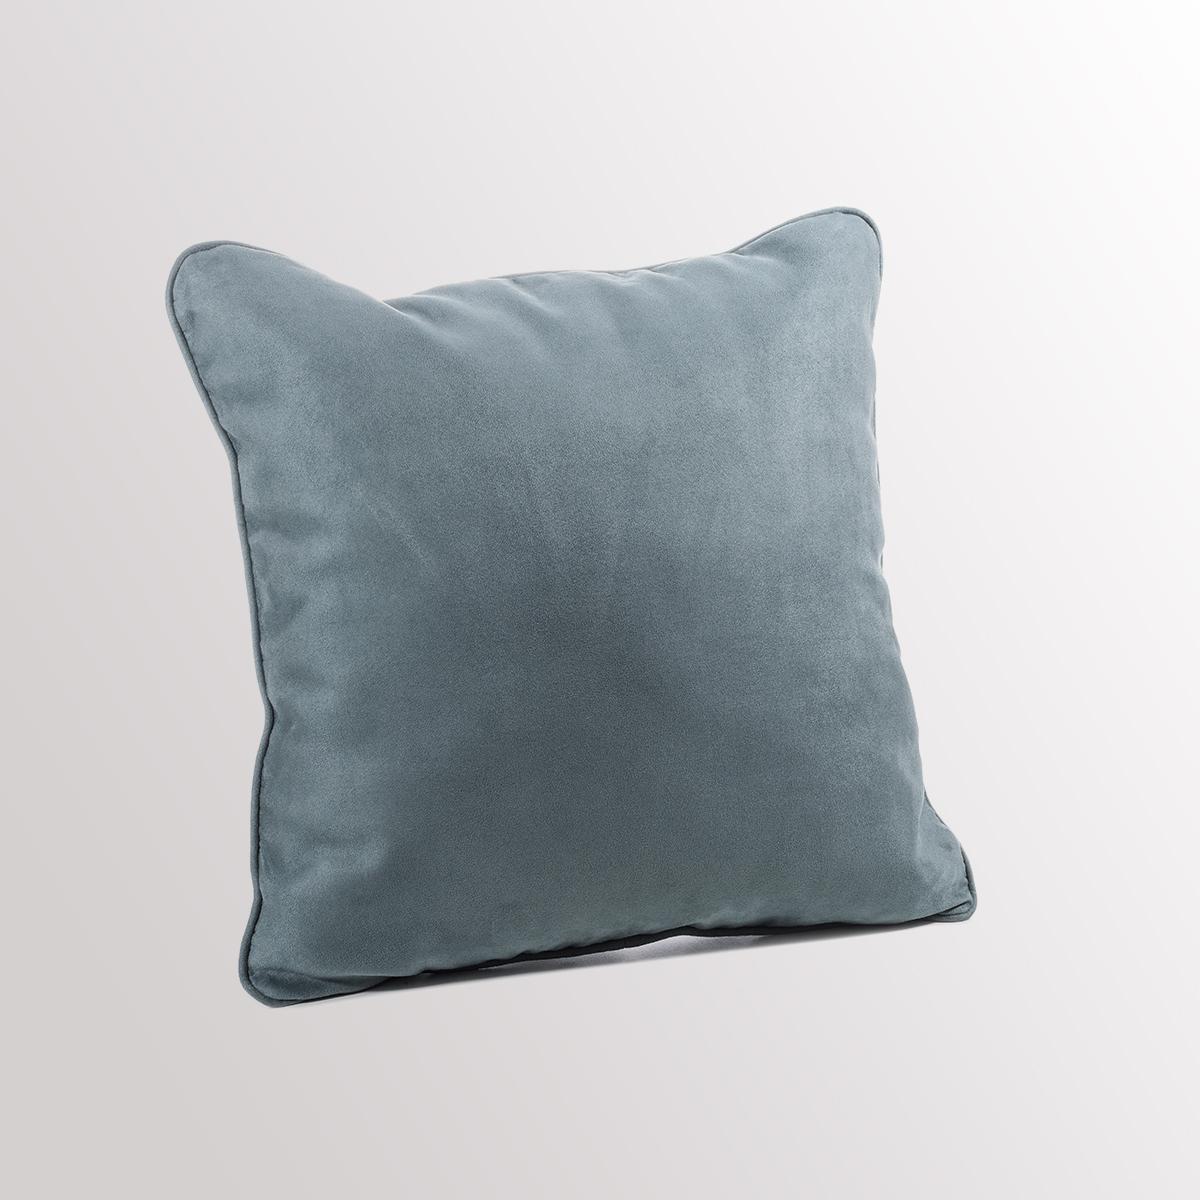 medium decorative cushion Medium decorative cushion colunex pillow decor medium 01